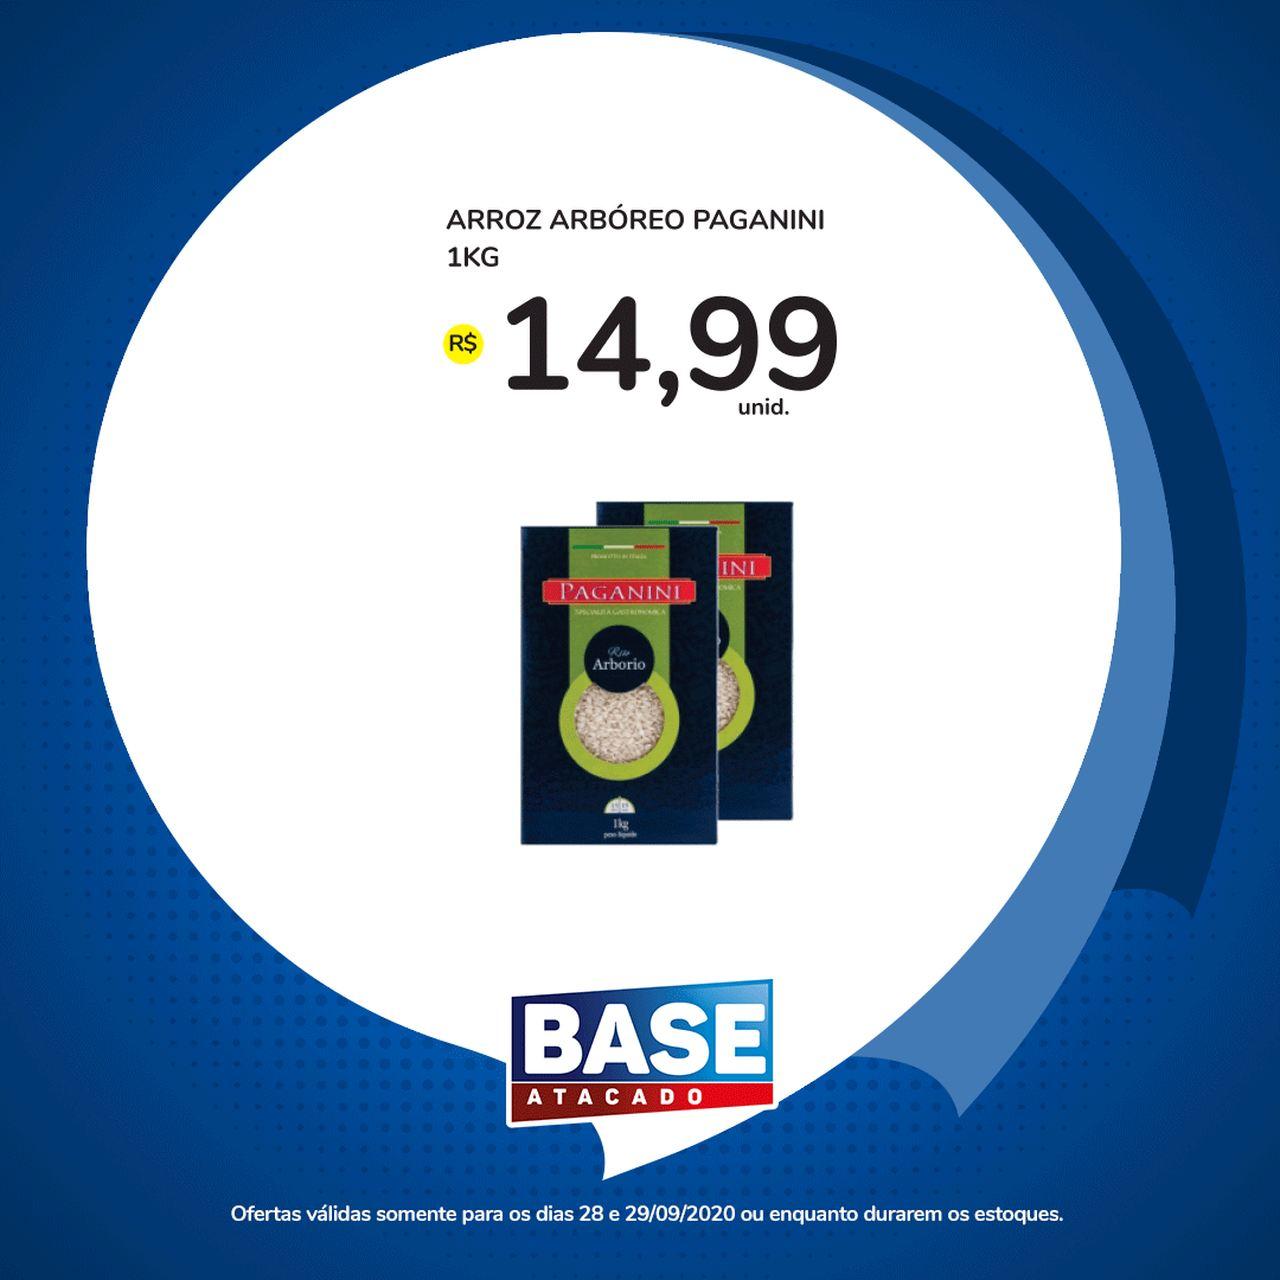 Ofertas de supermercado BASE atacado segunda e terça de super ofertas vence 29-09-6